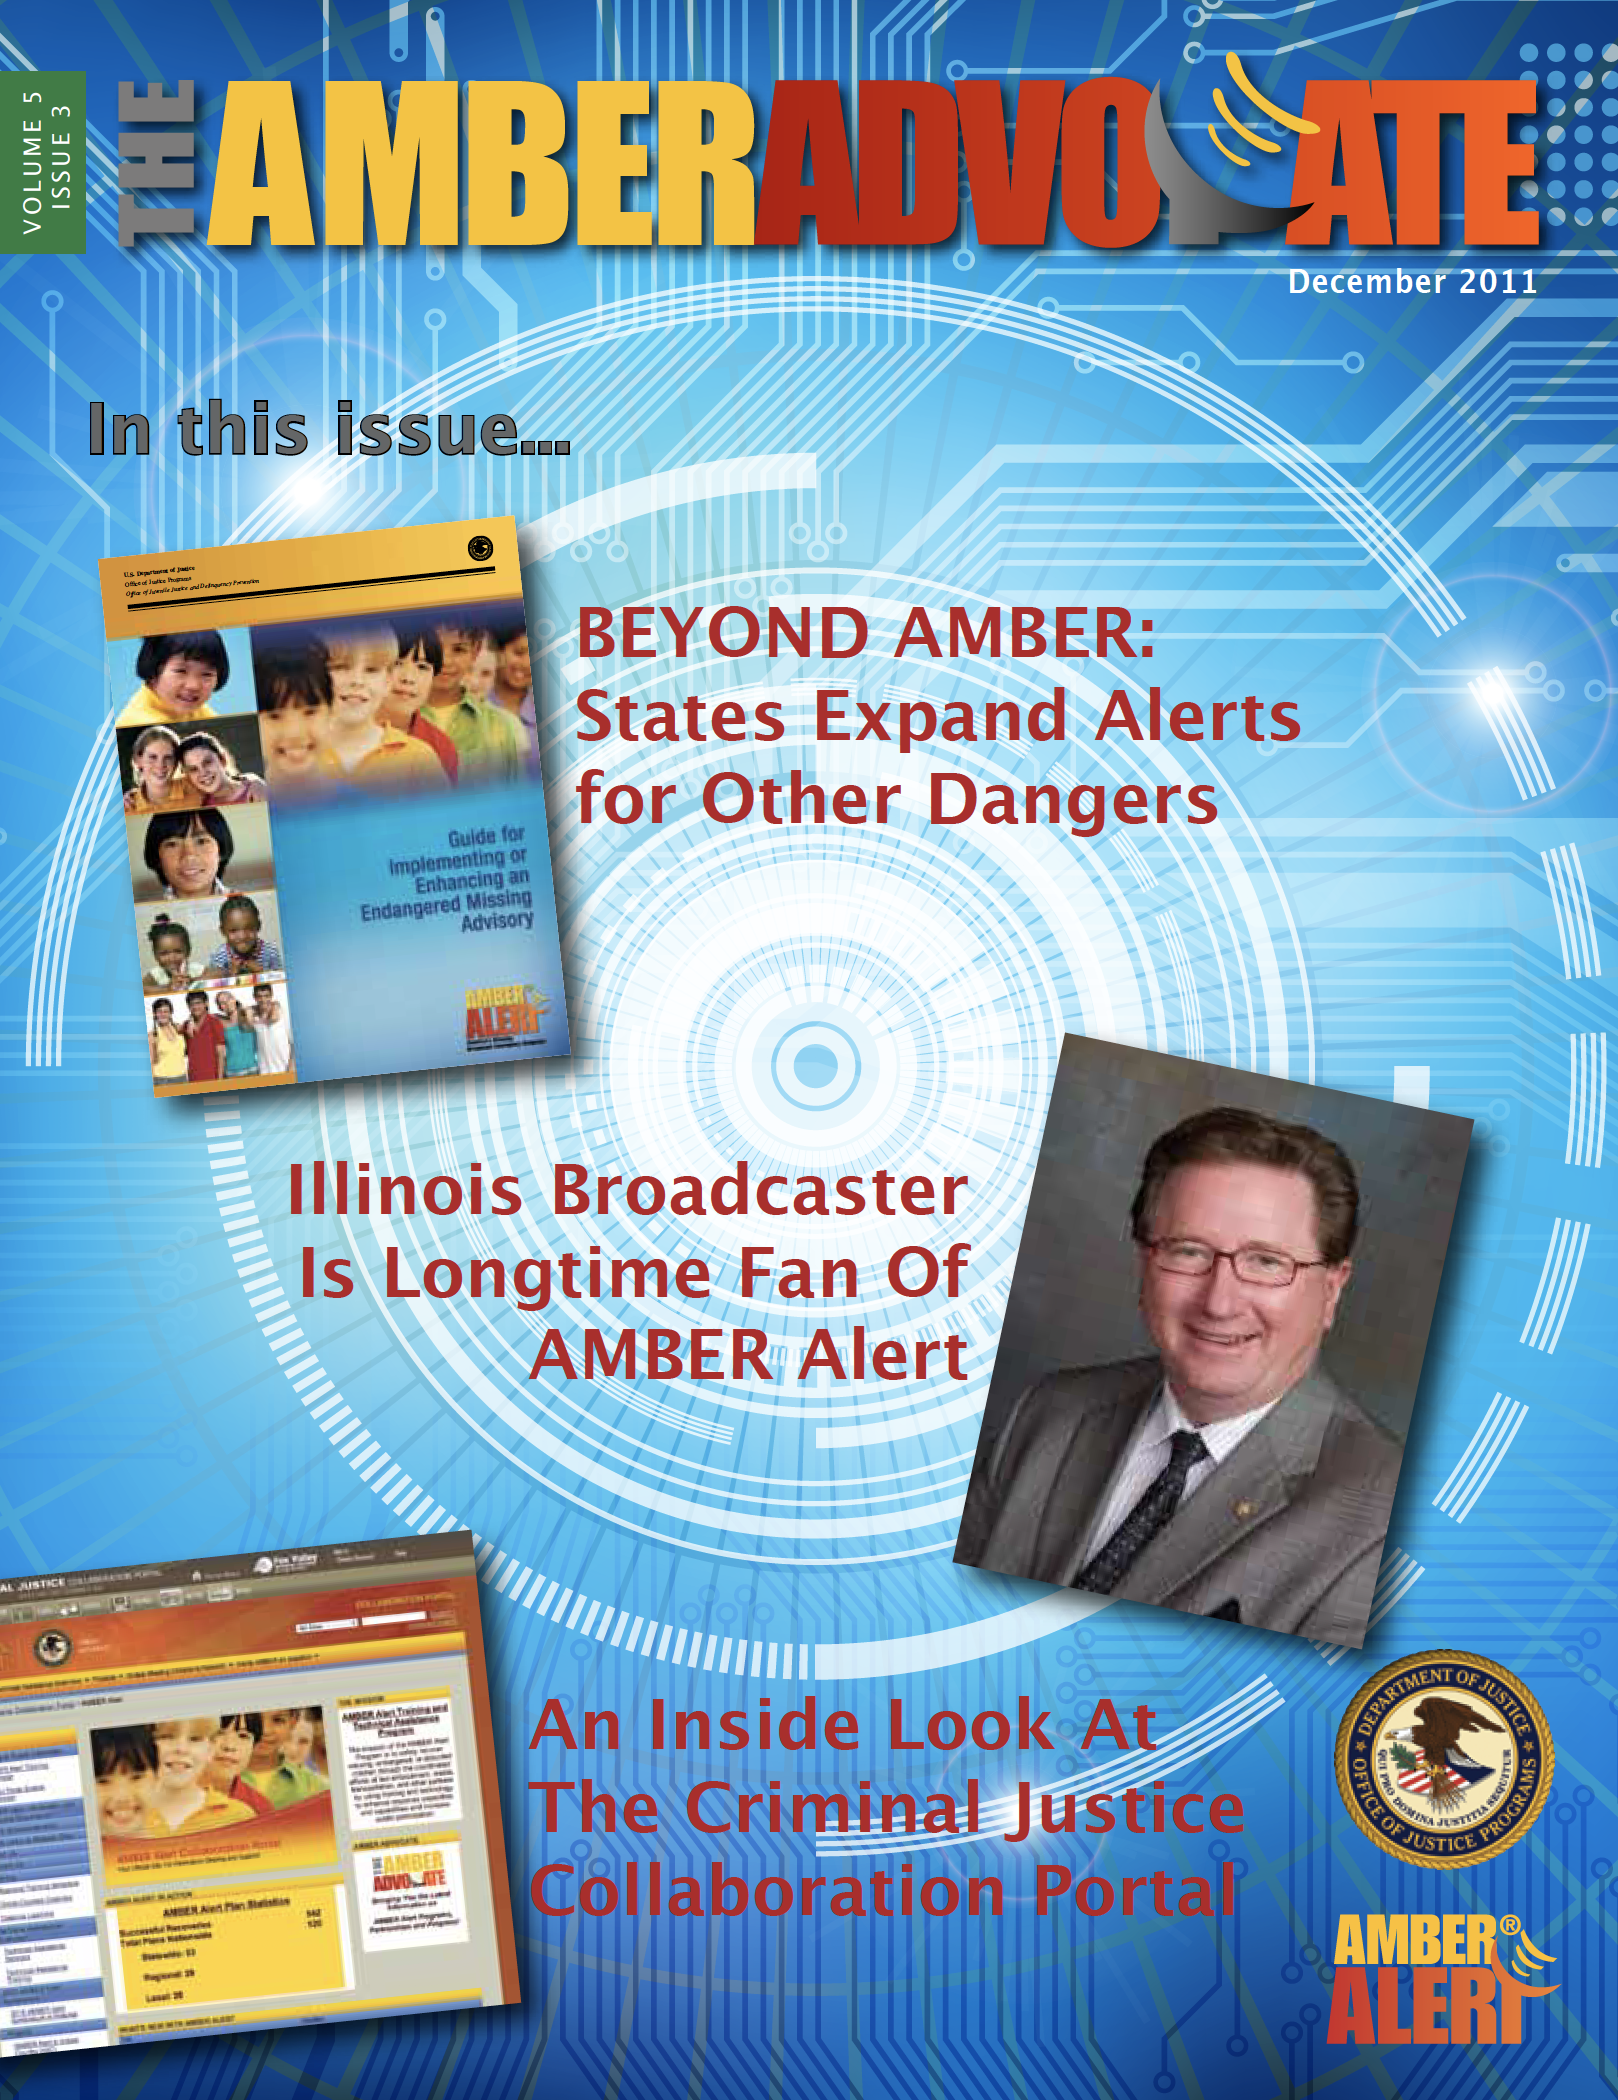 AMBER Advocate 18 cover